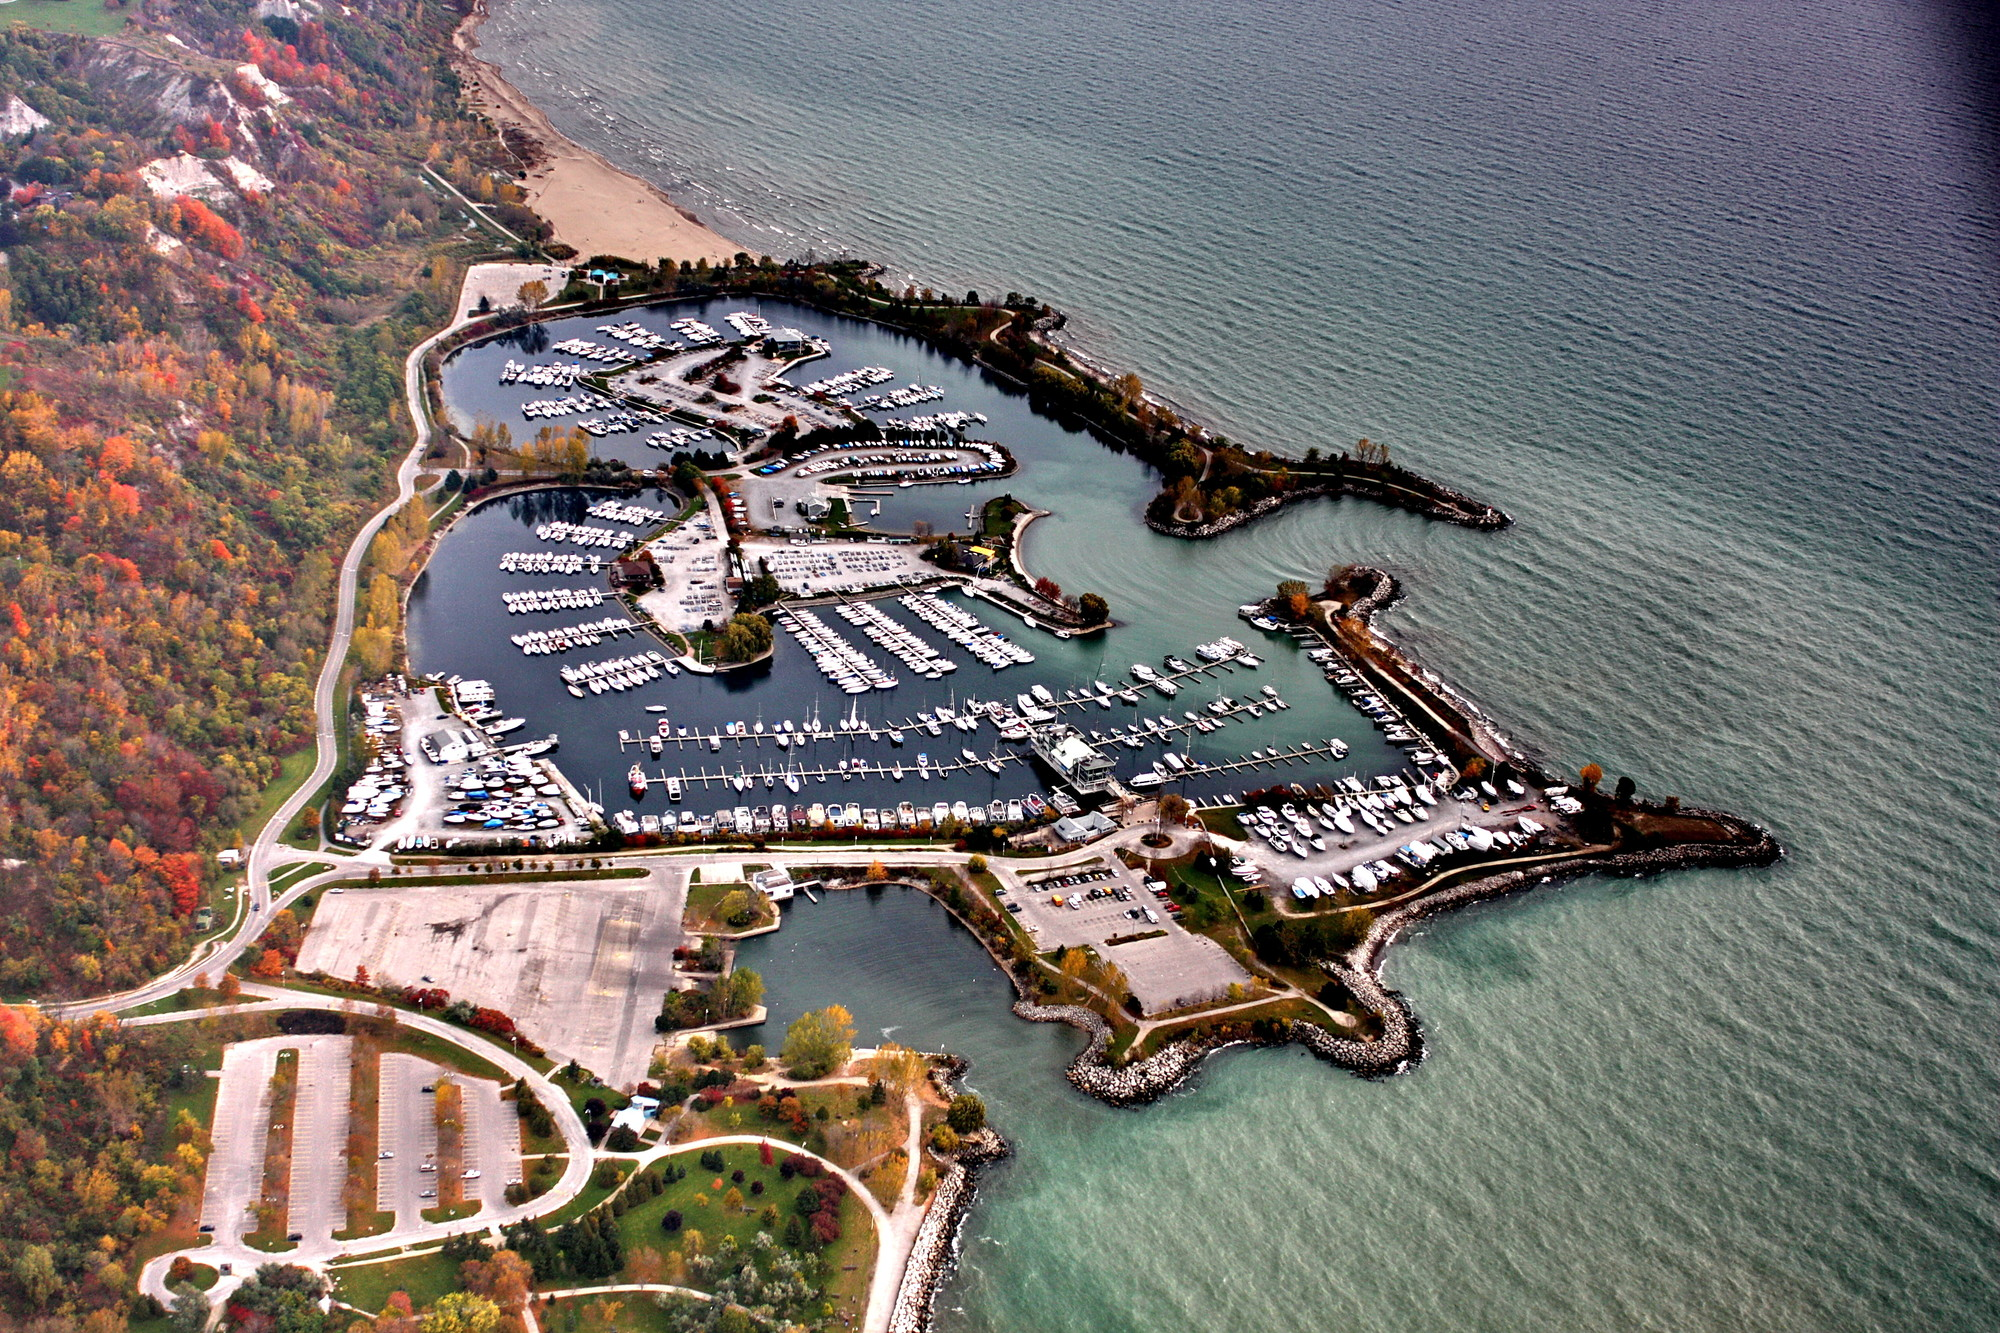 An aerial photograph of Bluffer's Park, October 2008